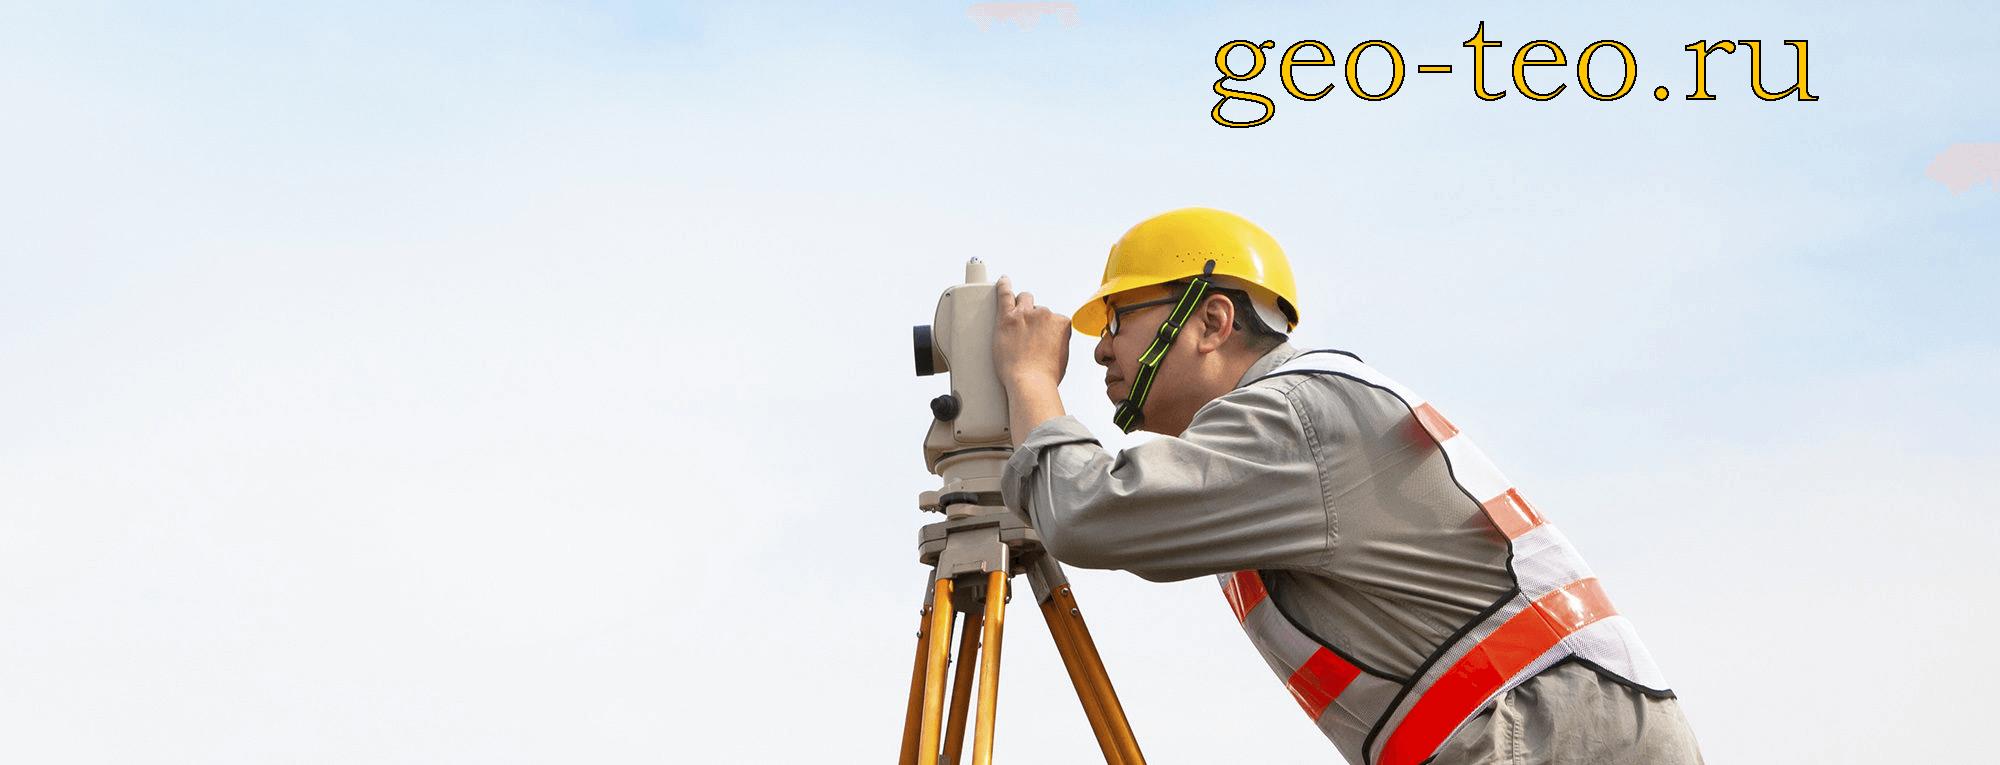 Роль геодезической съемки - фото